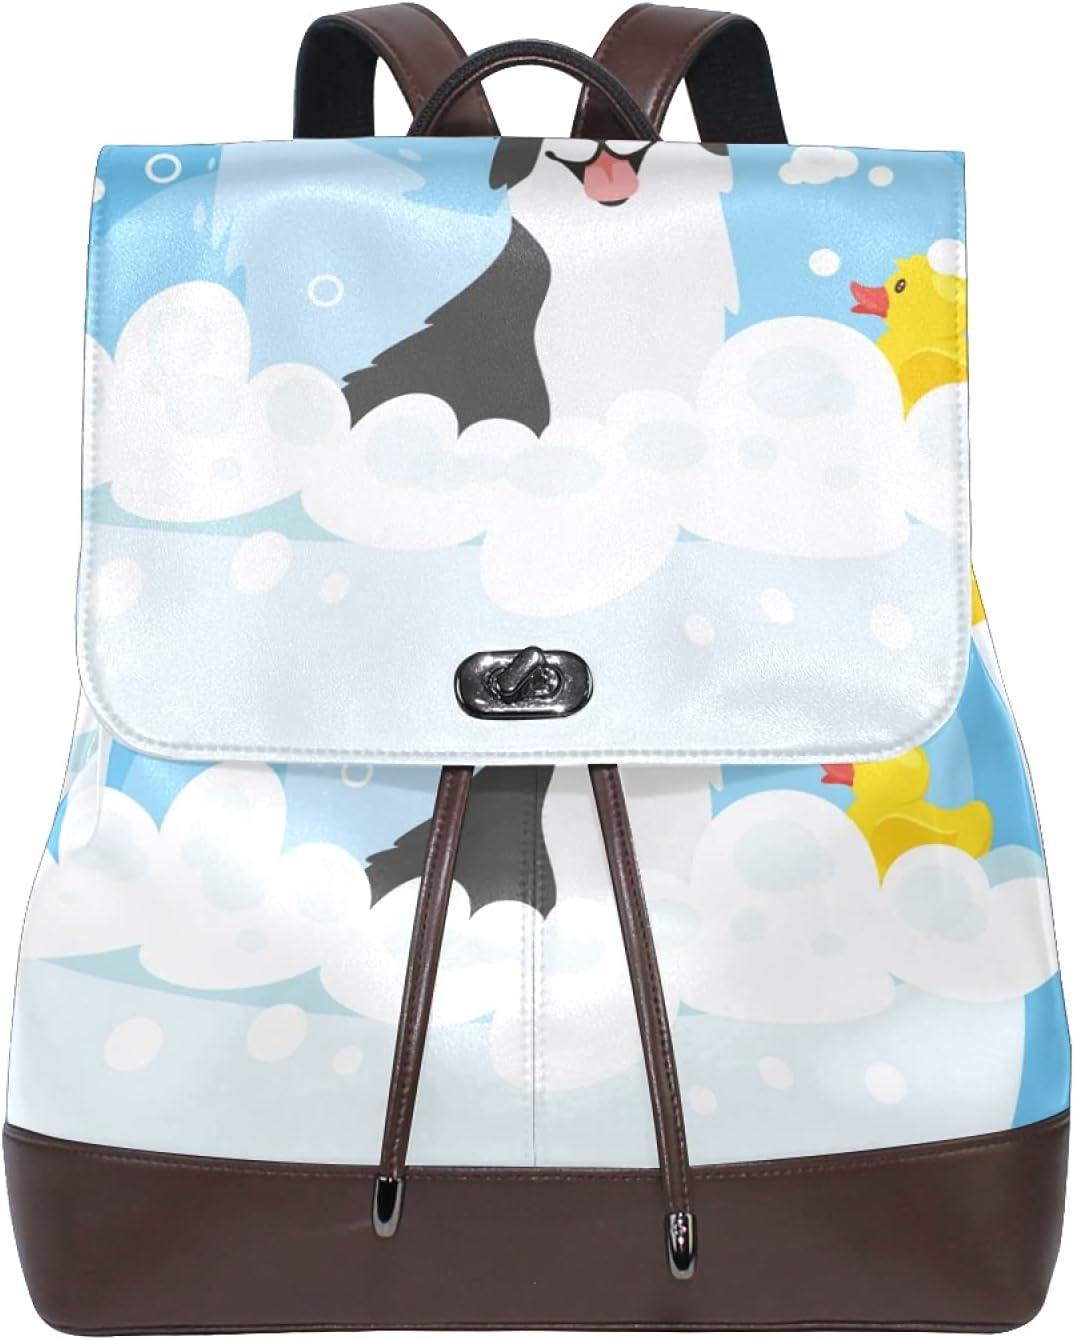 Women Leather Backpack Ladies Fashion Shoulder Bag Large Travel Bag Cartoon Dog Bathing Pattern